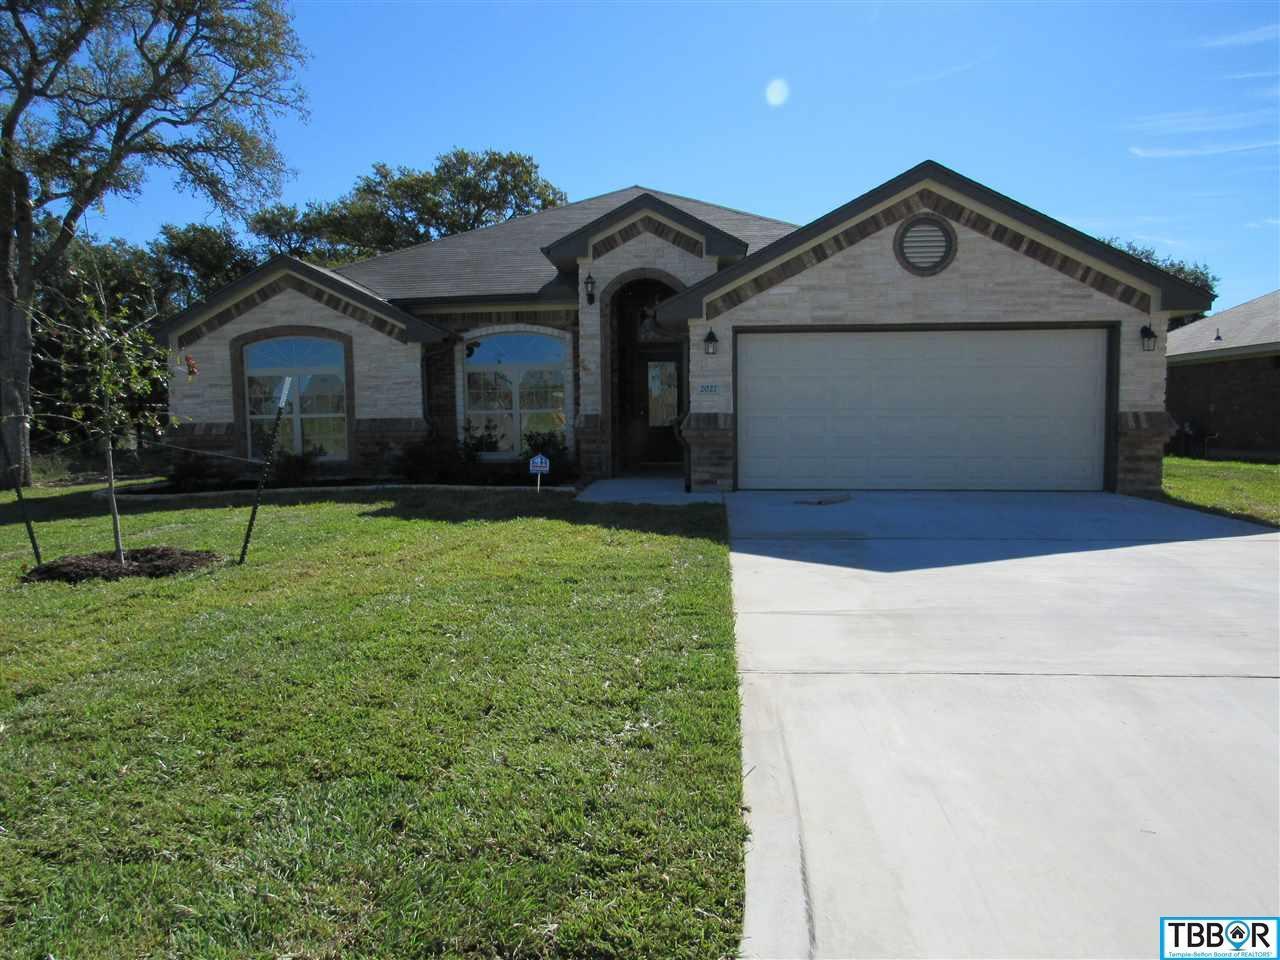 2027 Rustling Oaks, Harker Heights TX 76548 - Photo 1